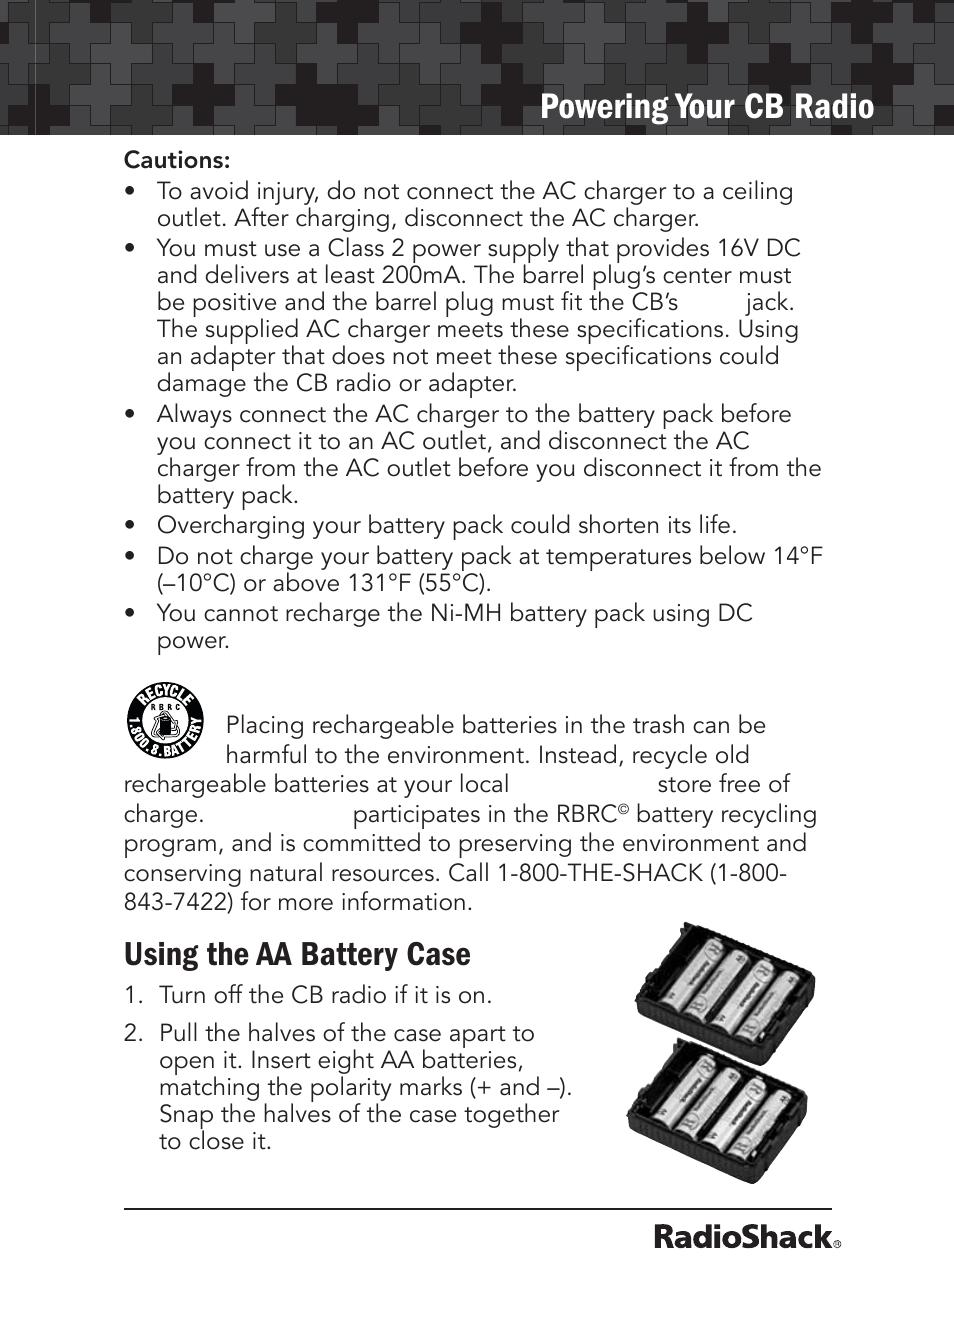 powering your cb radio using the aa battery case radio shack 21 rh manualsdir com Radio Shack Closing Radio Shack Products